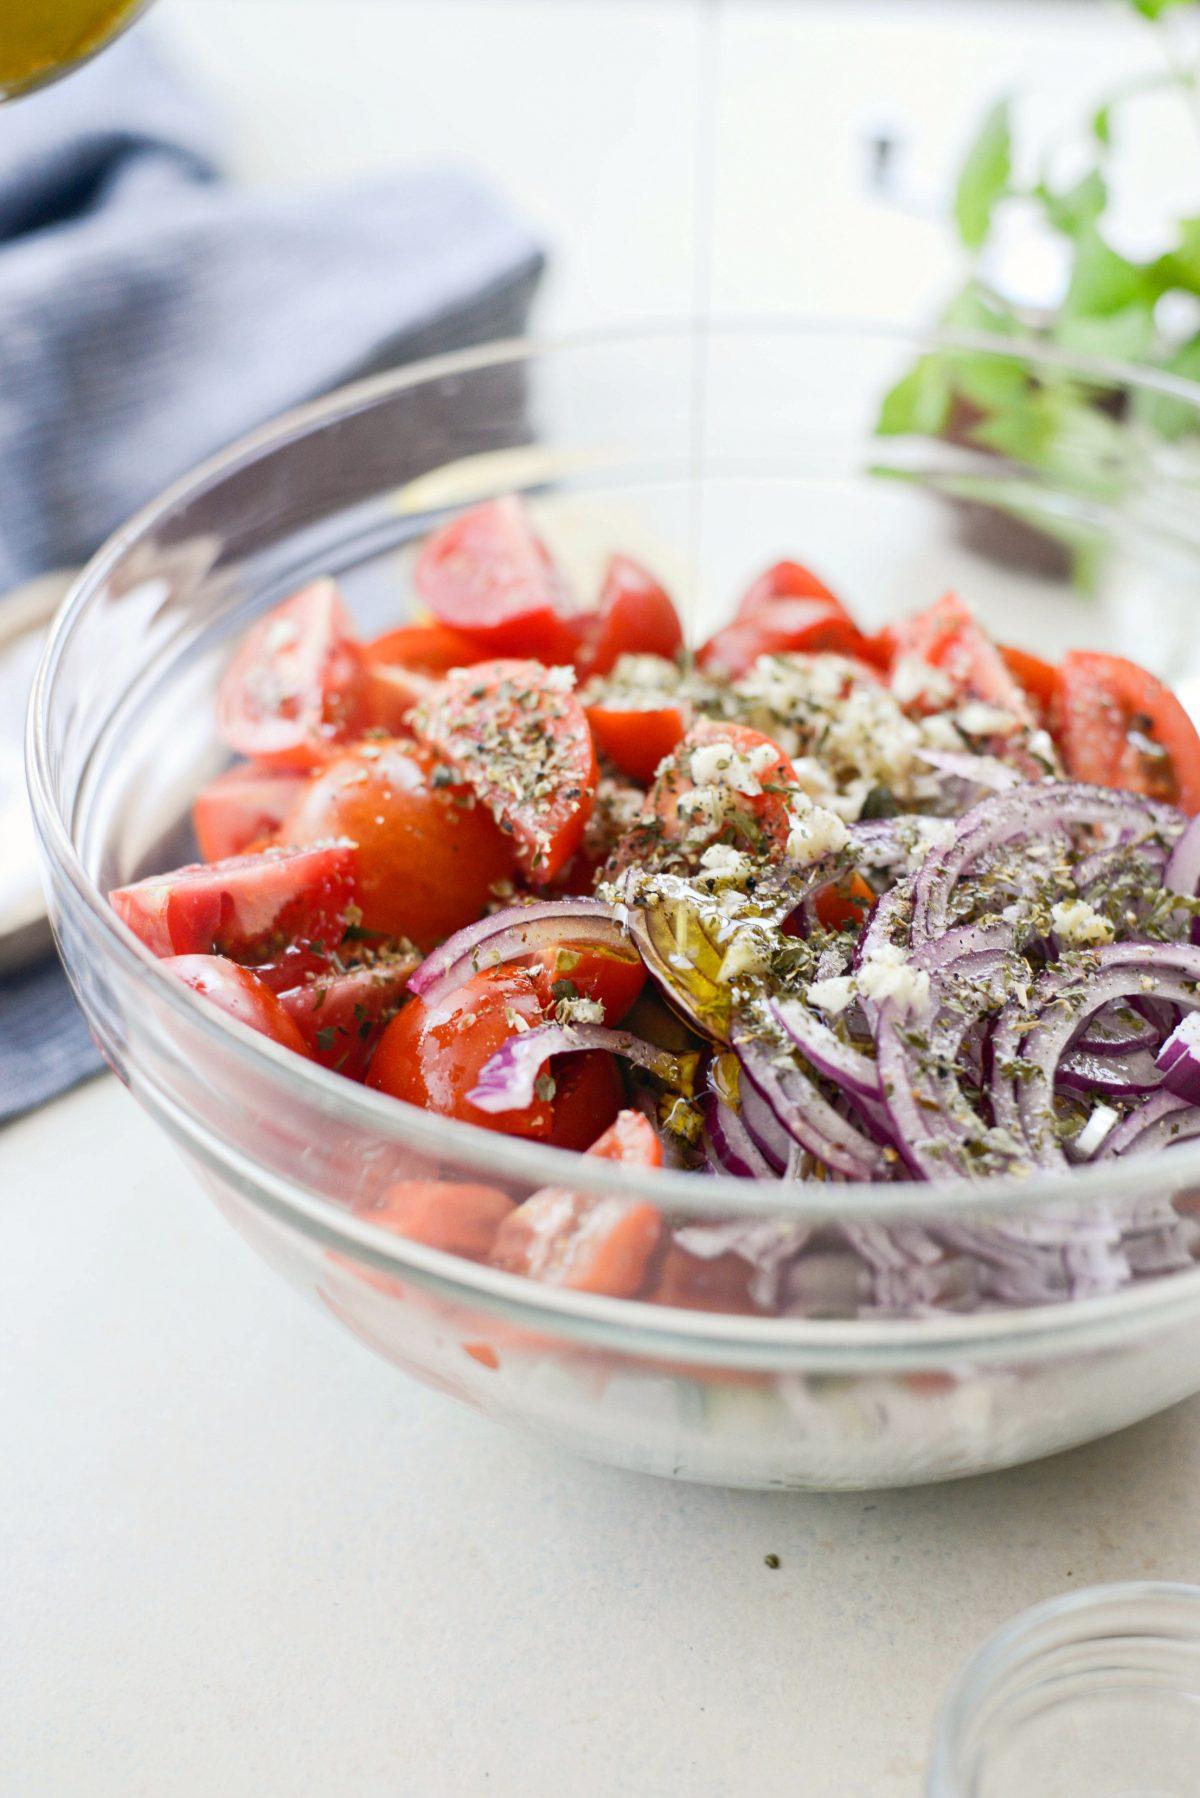 Cucumber Tomato Salad l SimplyScratch.com #cucumber #tomato #salad #lemon #vinaigrette